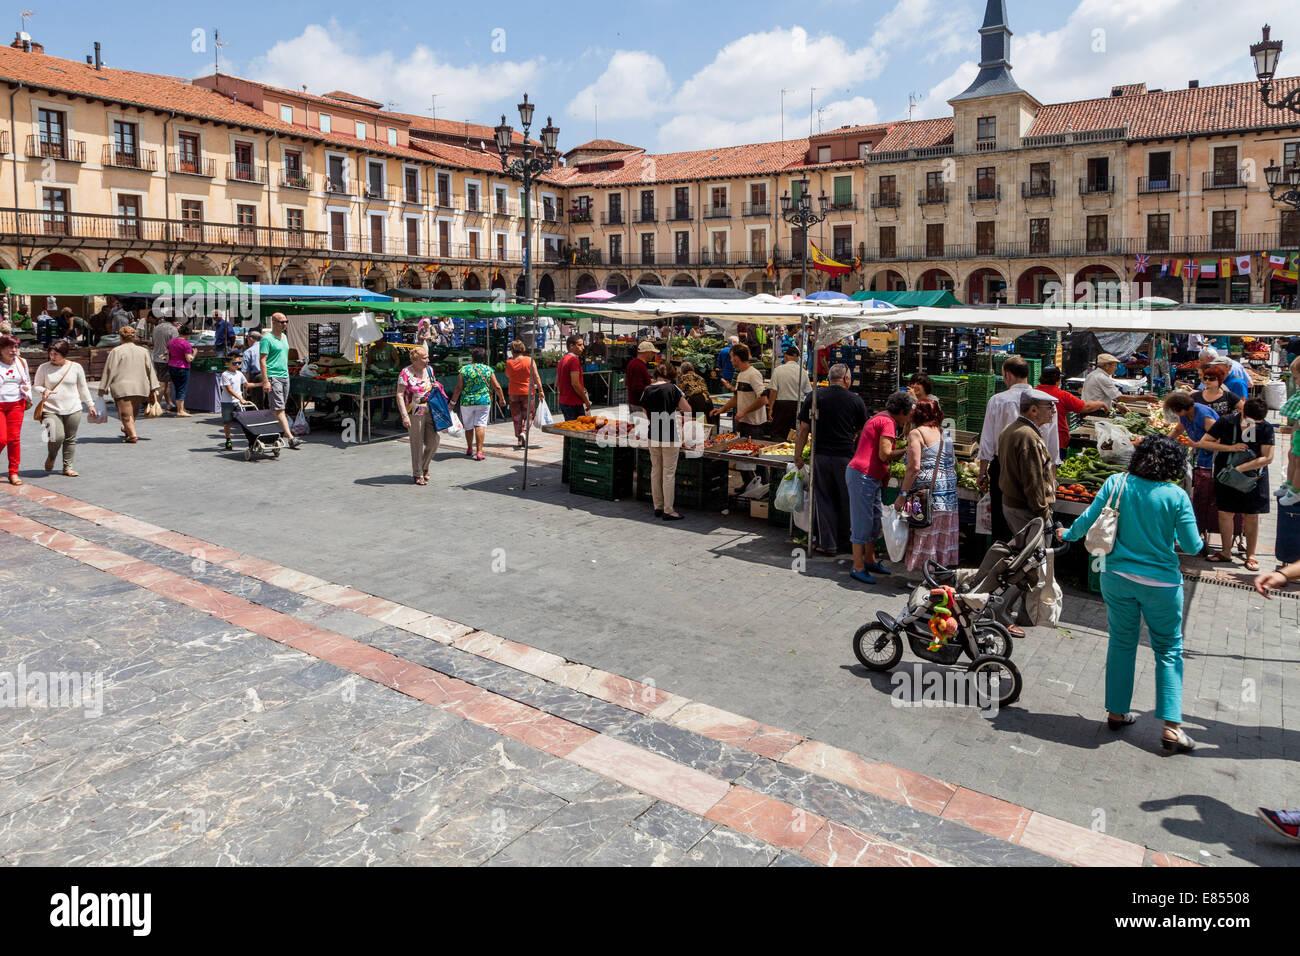 Market Day Plaza Mayor, Leon Spain; locals and tourists alike wander around Plaza Major shopping the market. - Stock Image